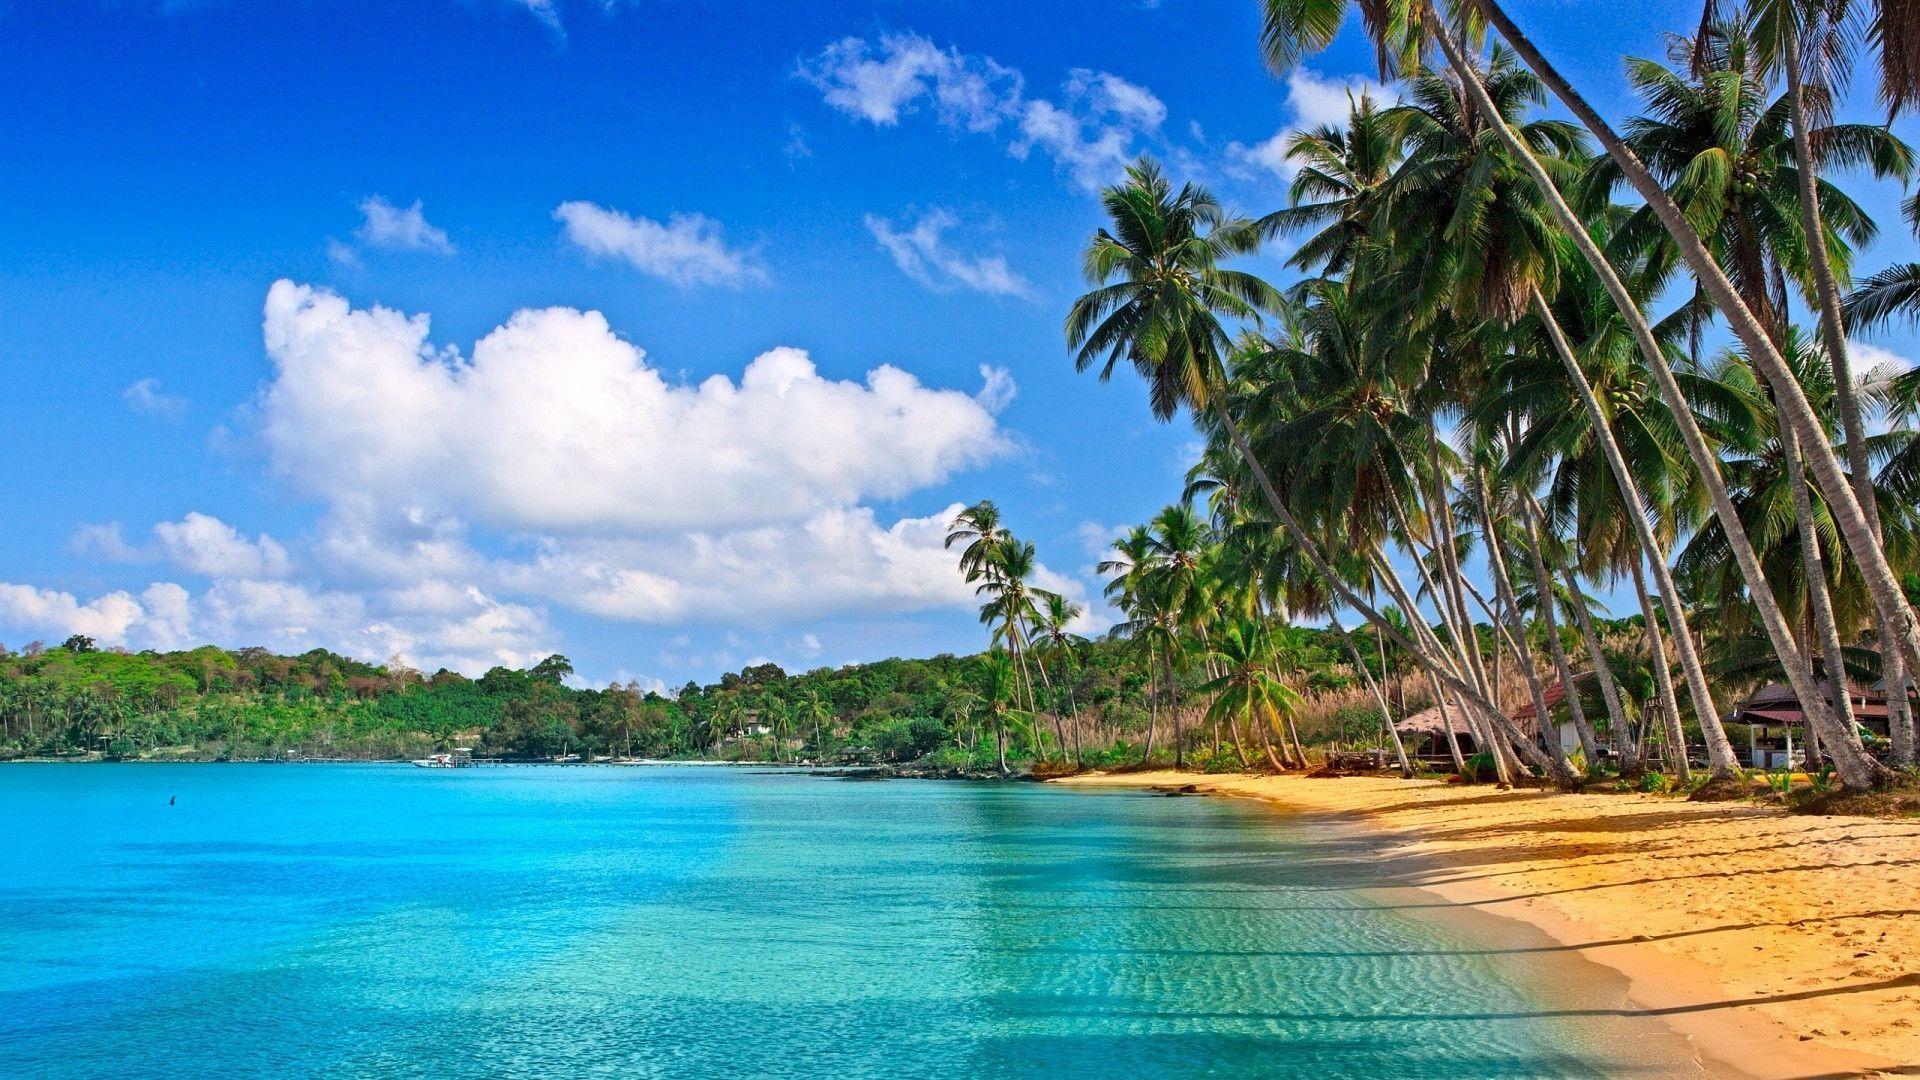 full hd 1080p beach